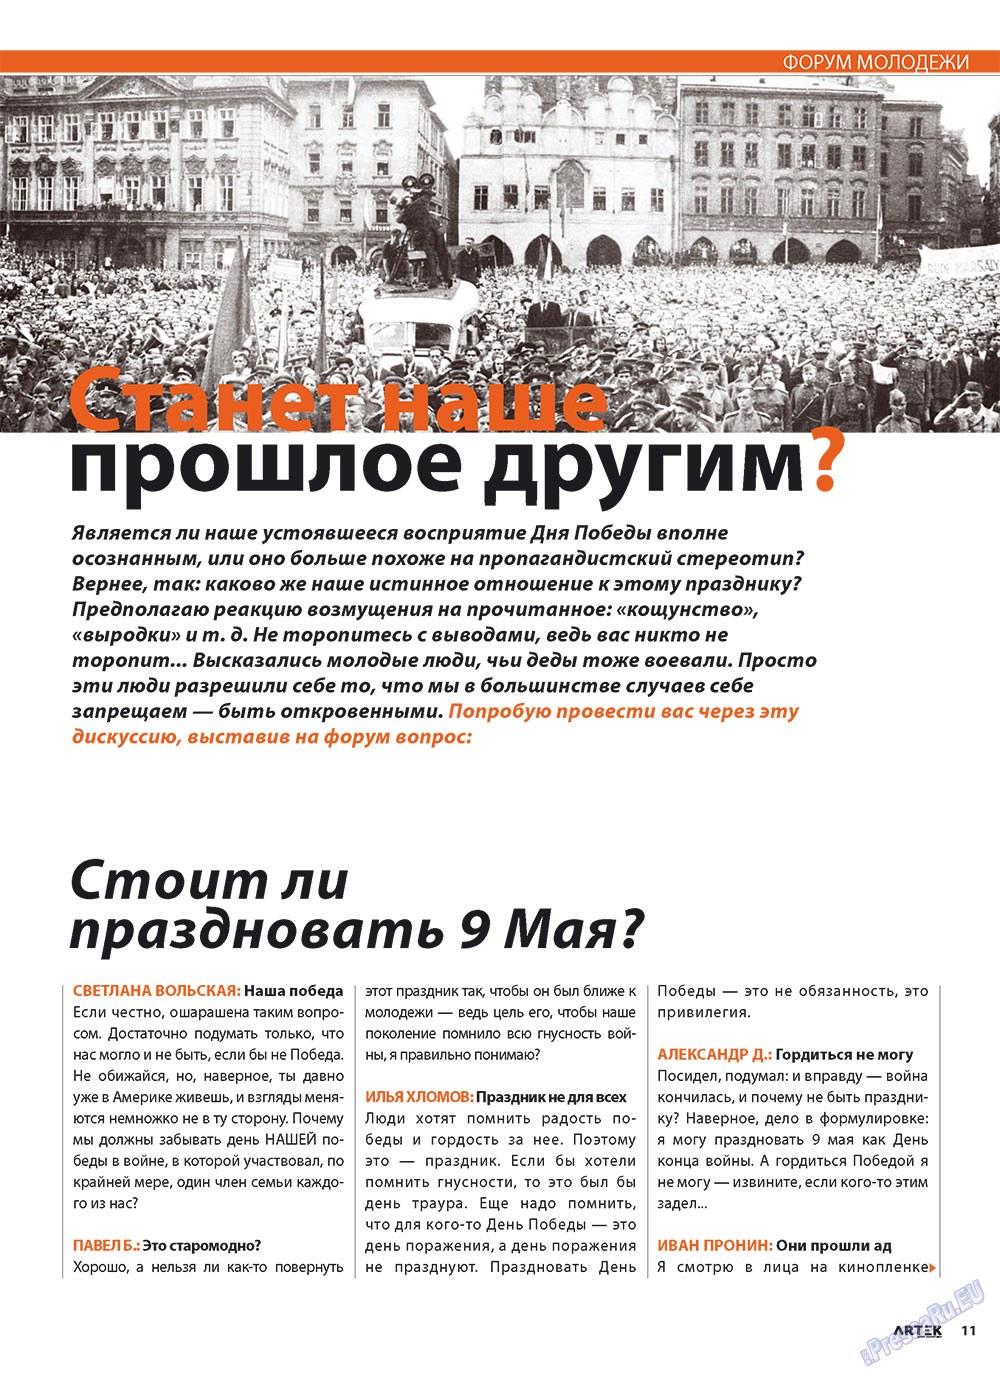 Артек (журнал). 2010 год, номер 2, стр. 13